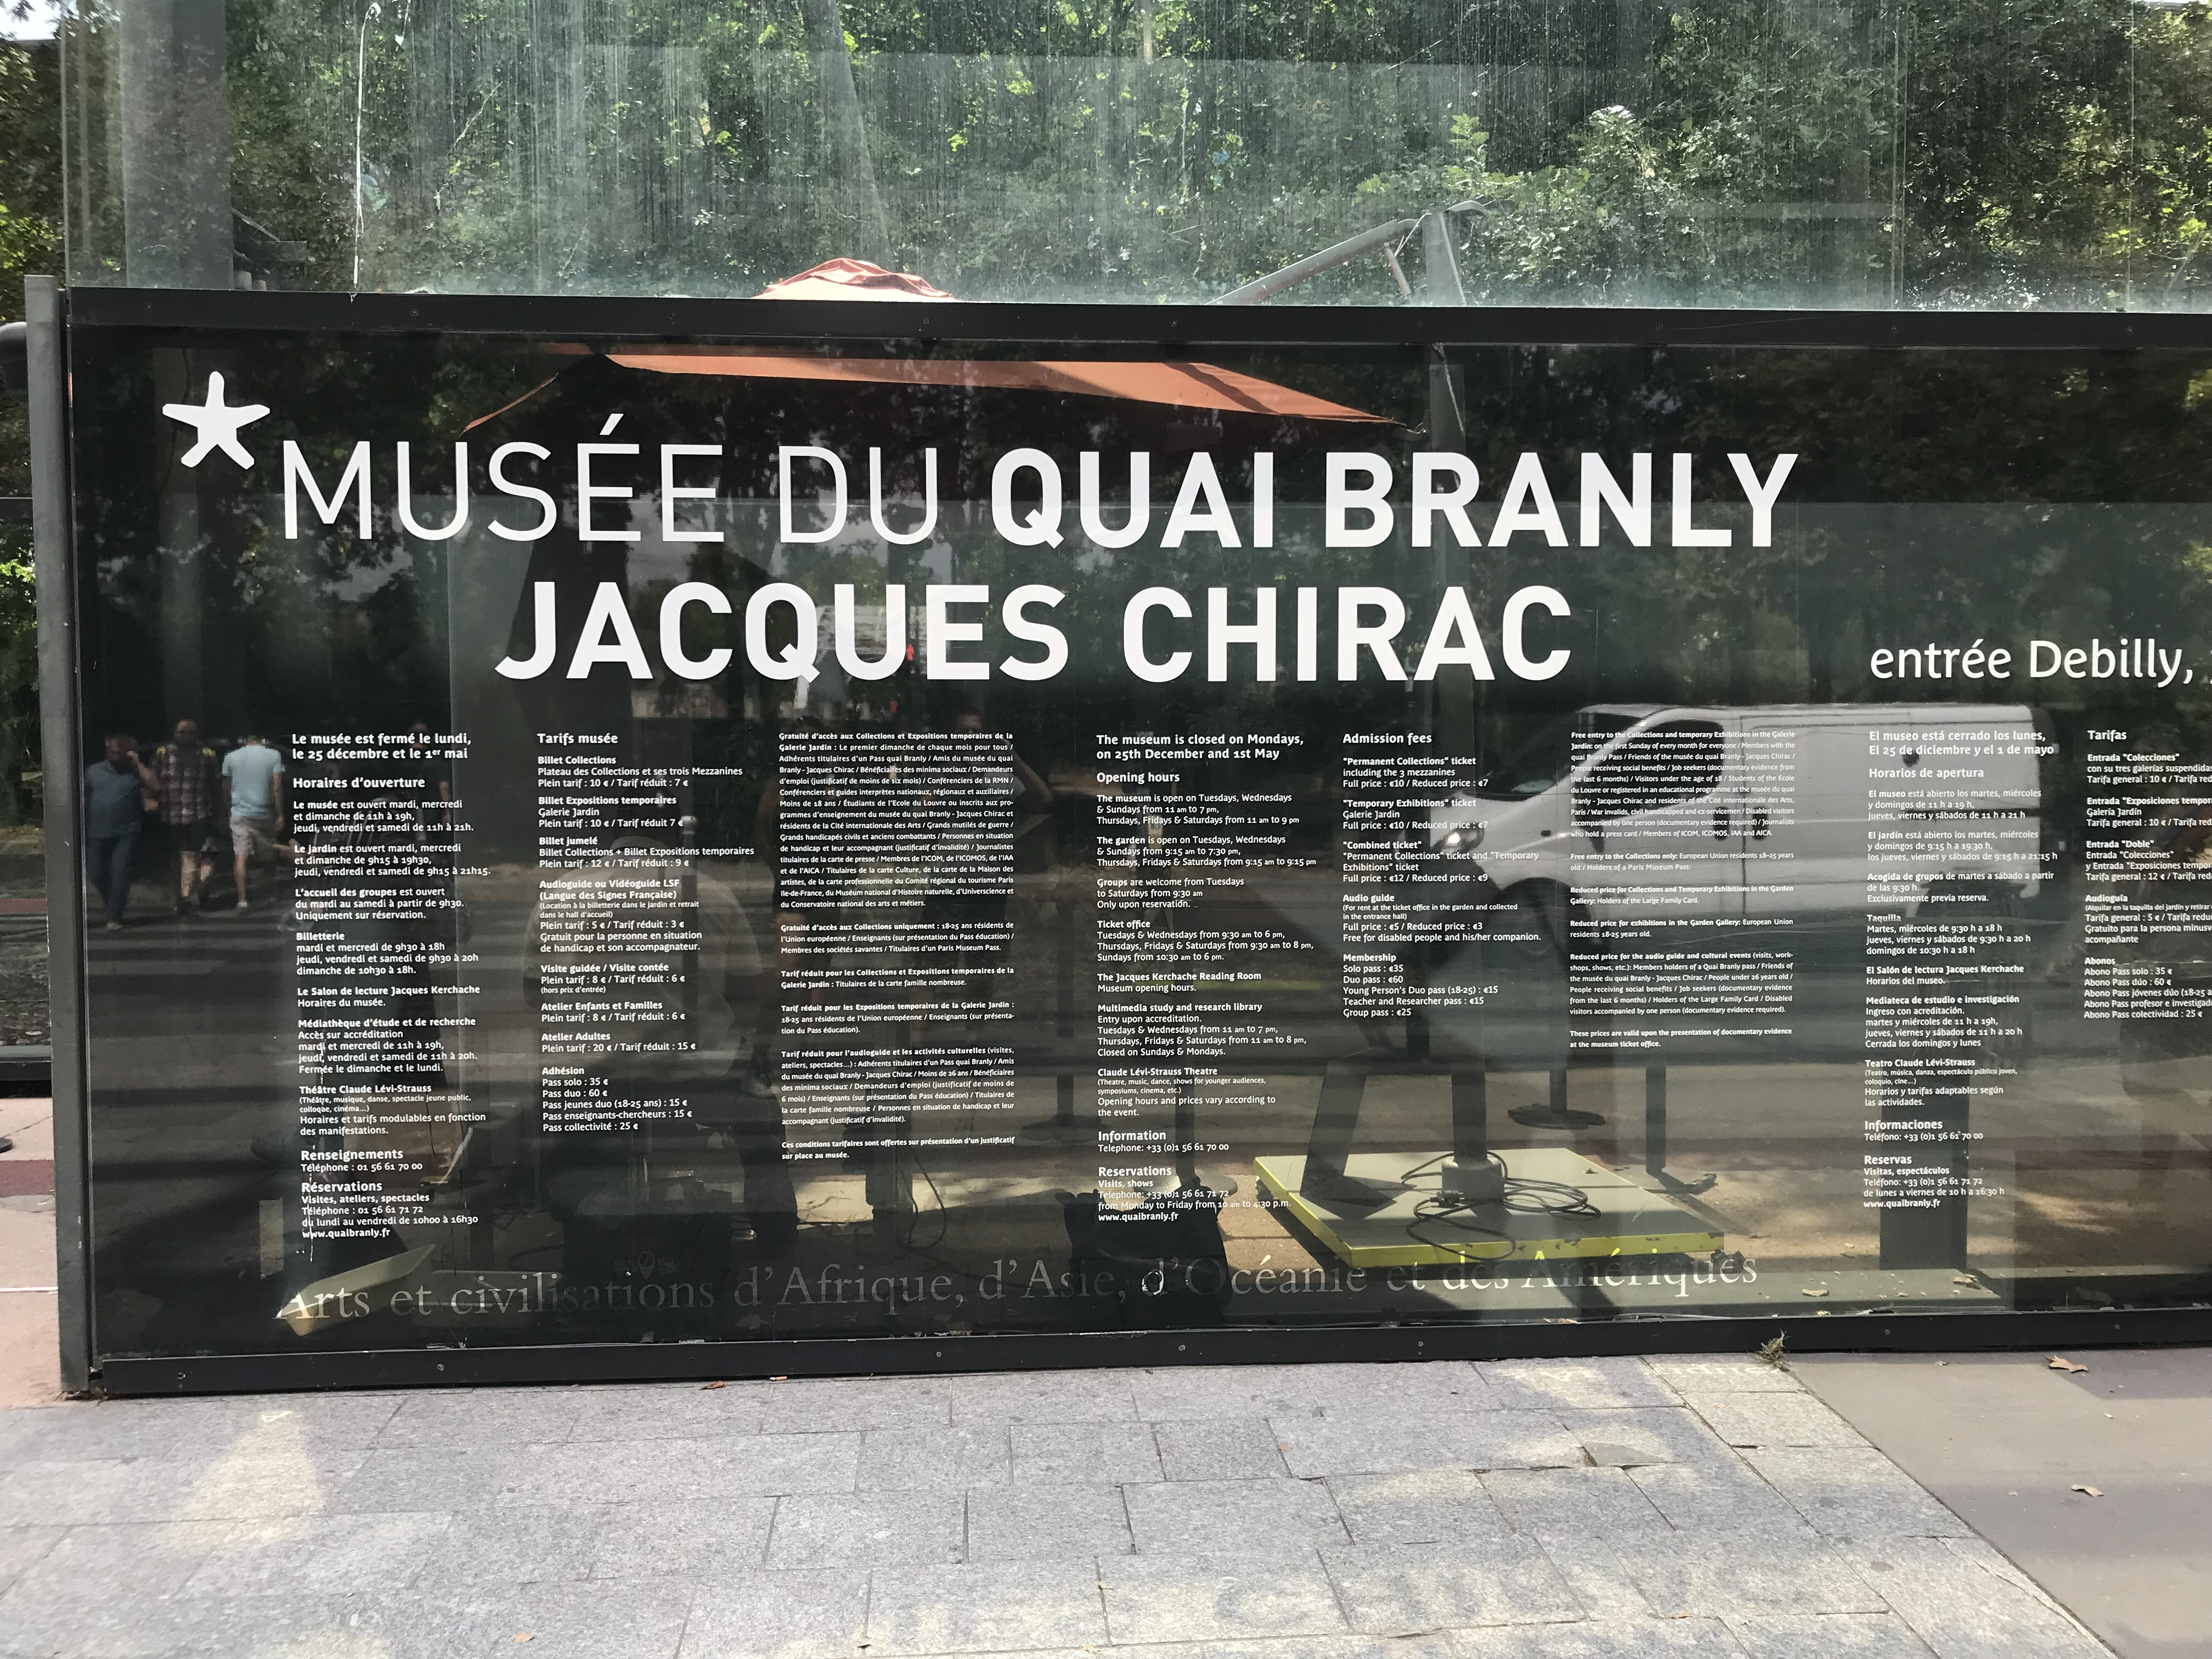 MuseeQuayBranly